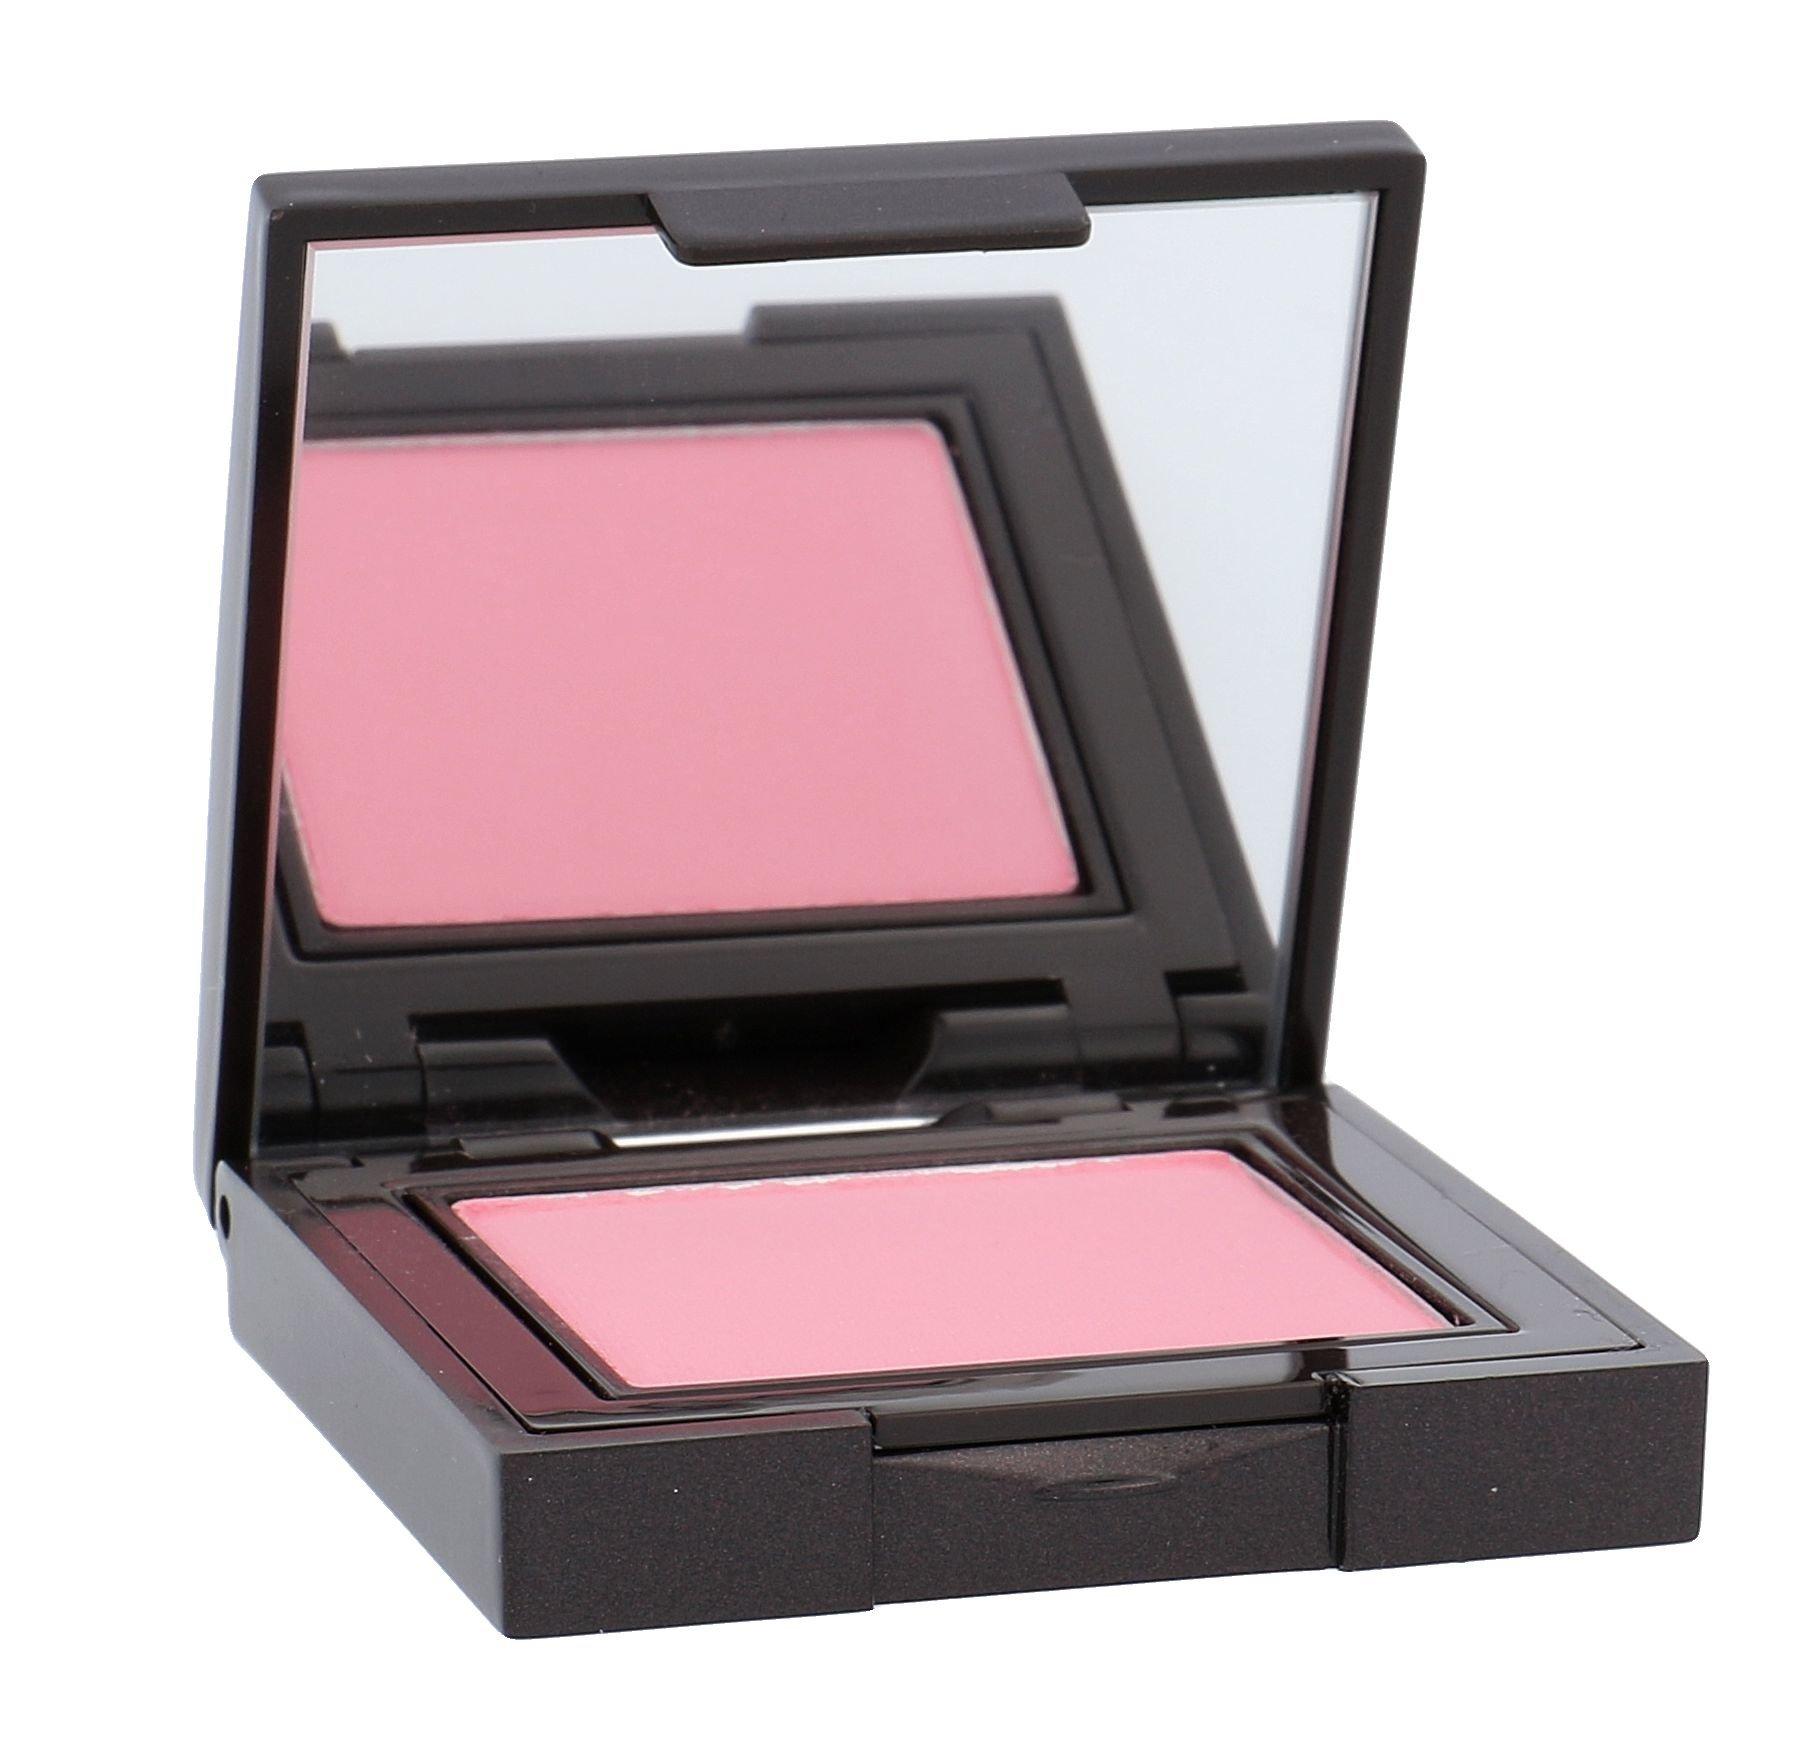 Laura Mercier Second Skin Cheek Colour Cosmetic 3,6ml Heather Pink